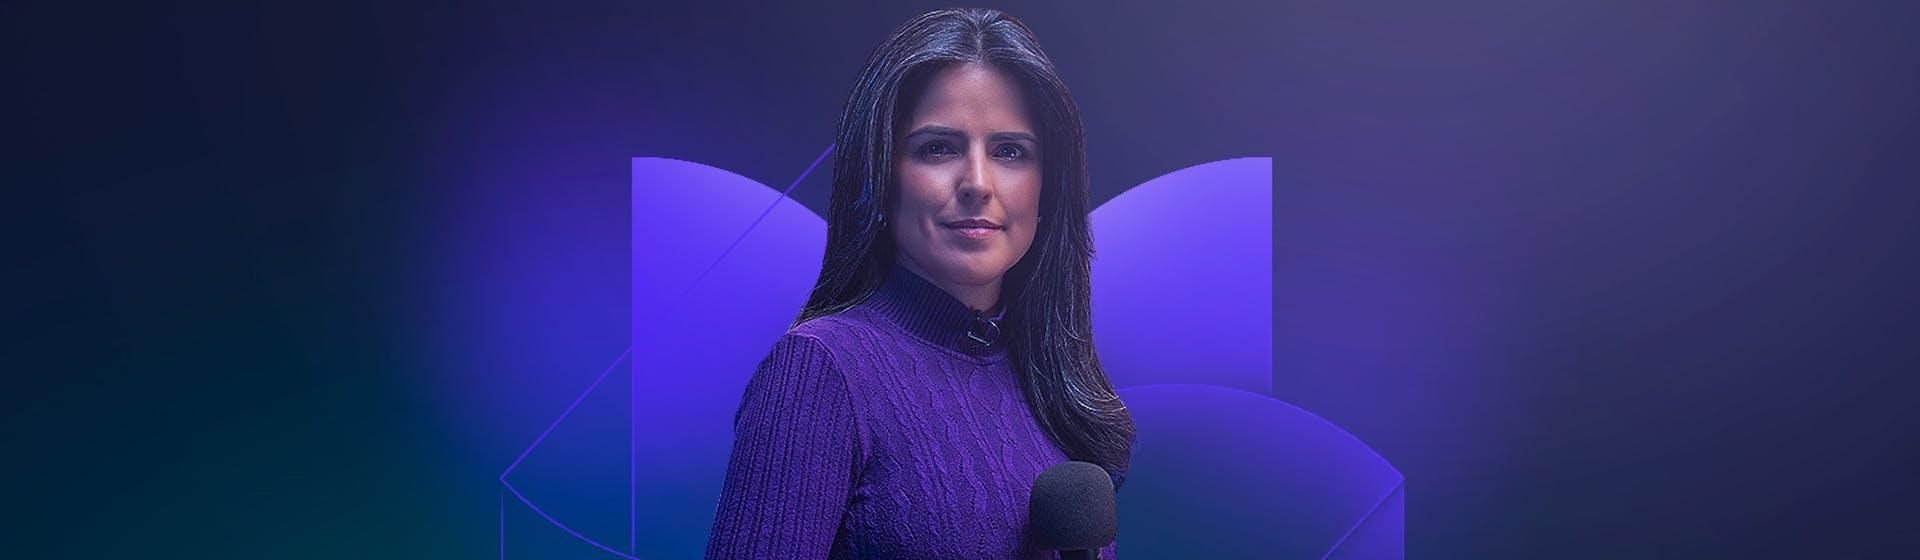 Conoce a Claudia Palacios: La premiada periodista llega a Crehana